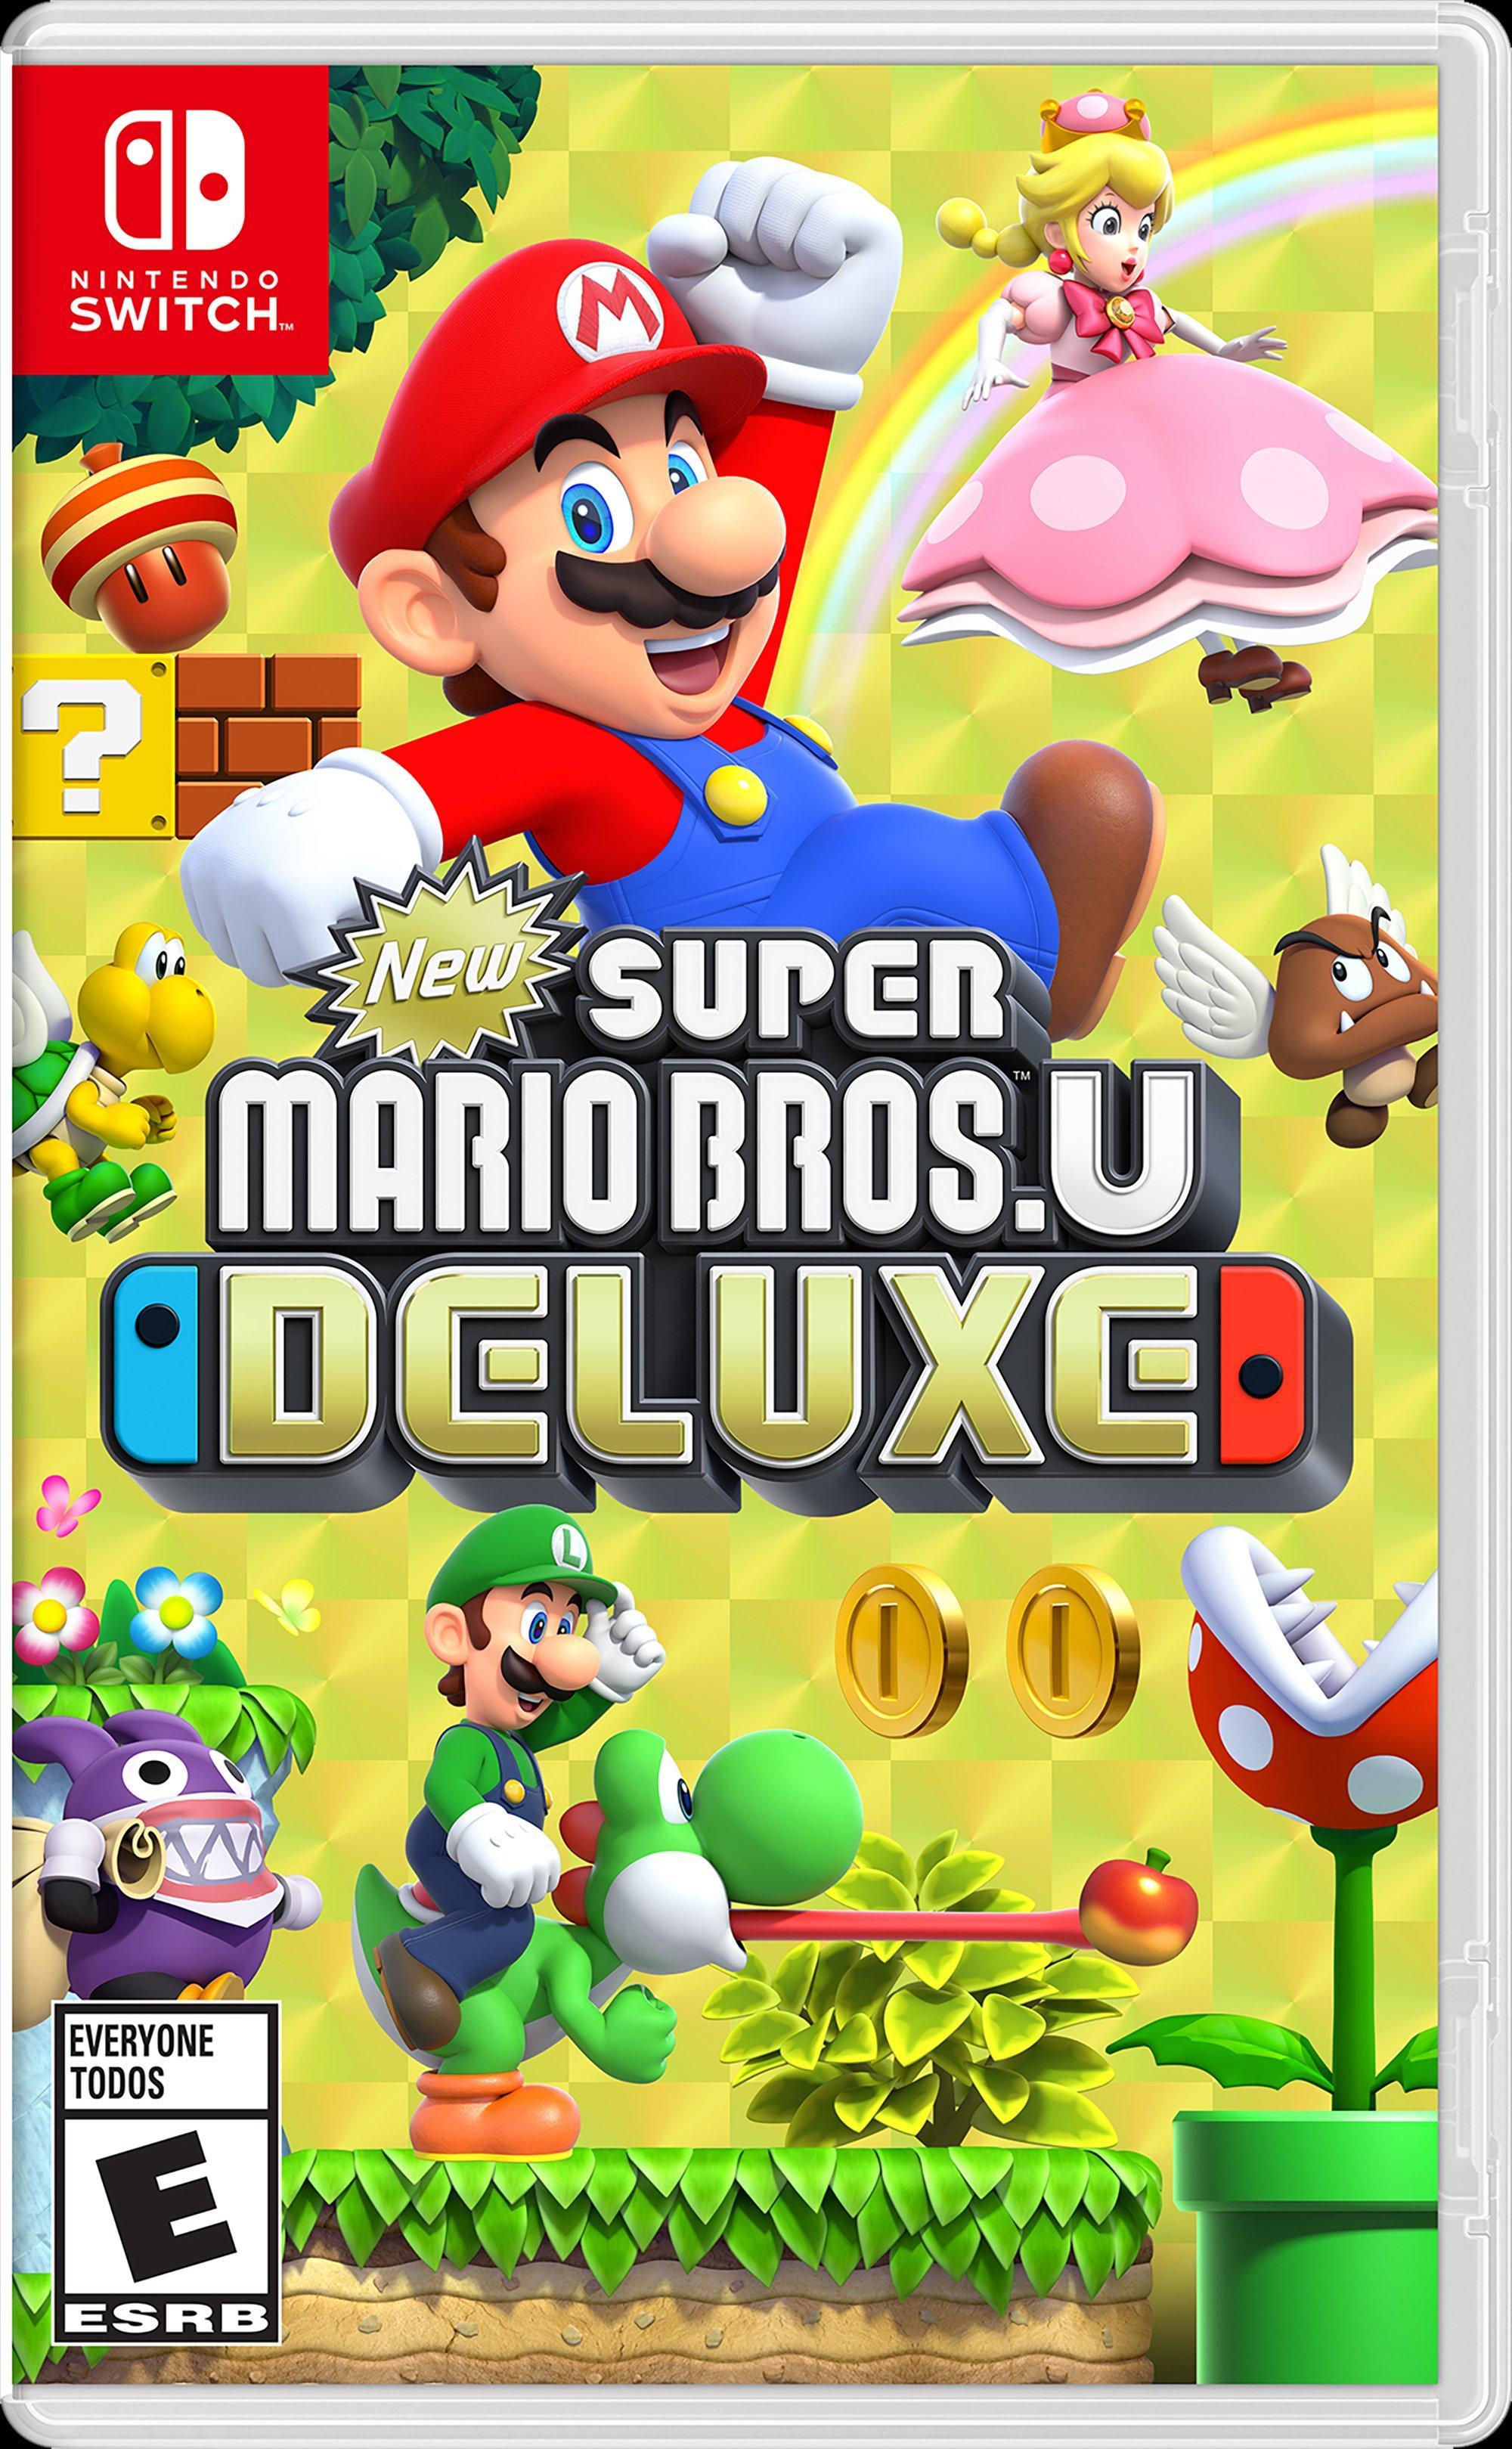 New Super Mario Bros U Deluxe | Nintendo Switch | GameStop